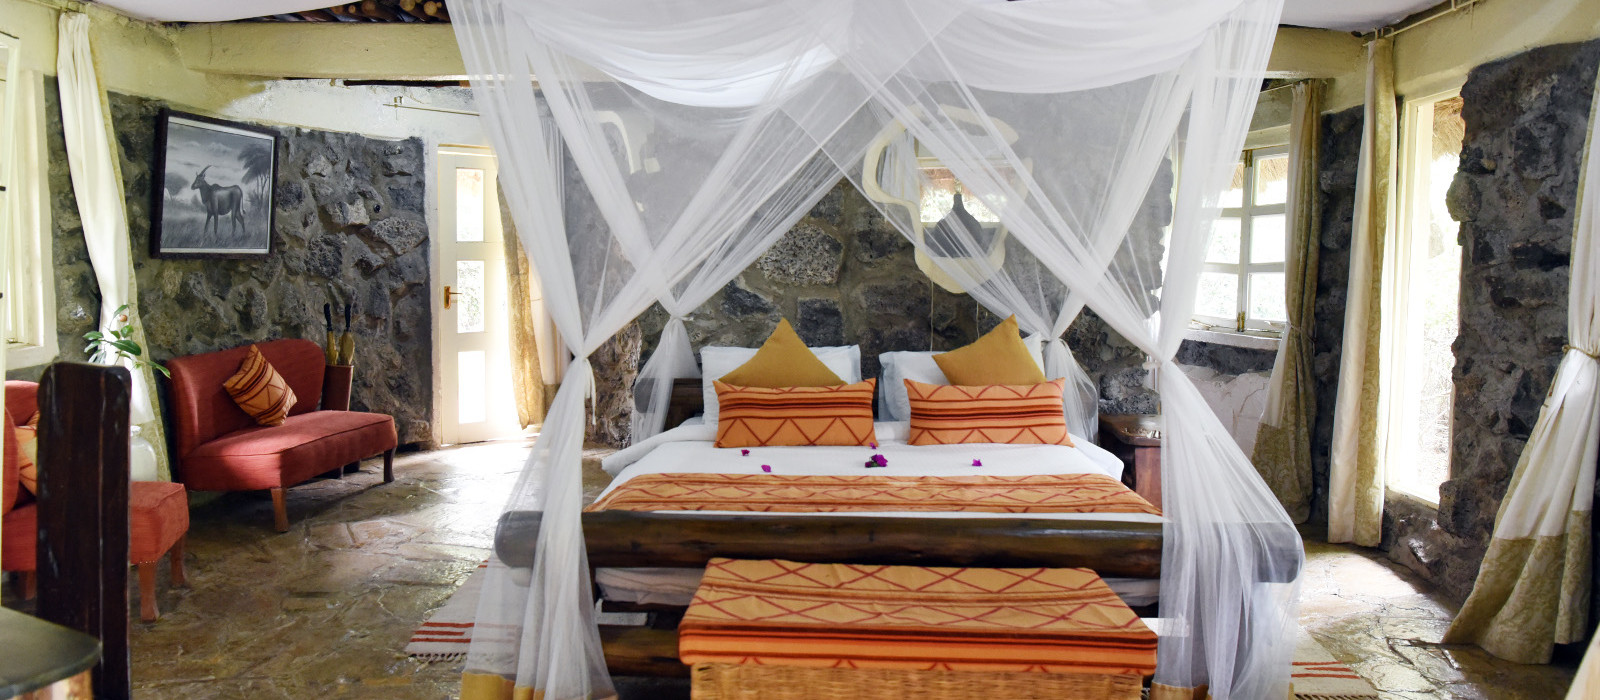 Hotel Mbweha Safari Camp Kenia